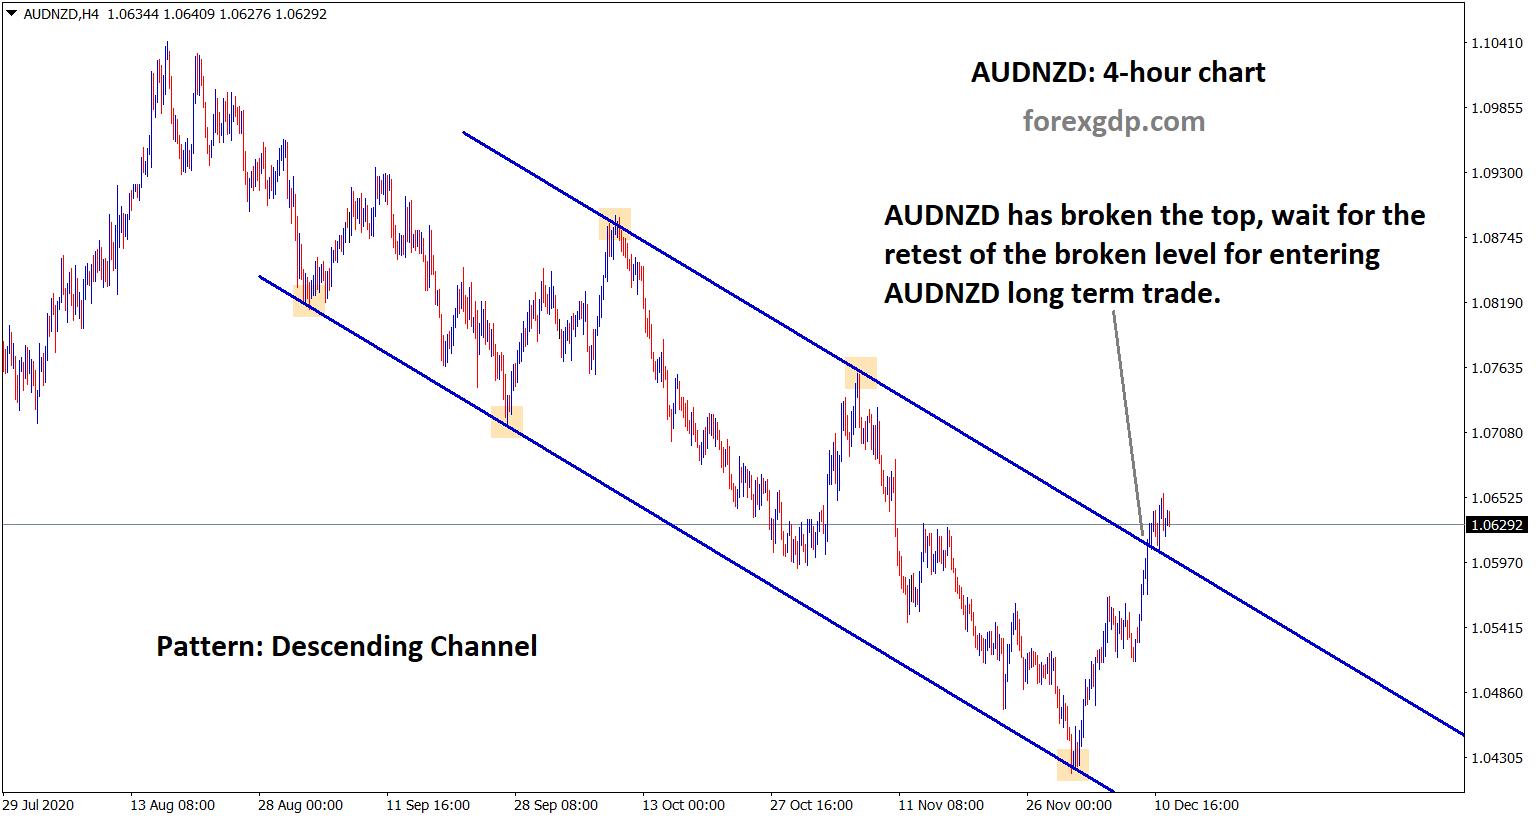 audnzd descending channel broken and wait for retesting